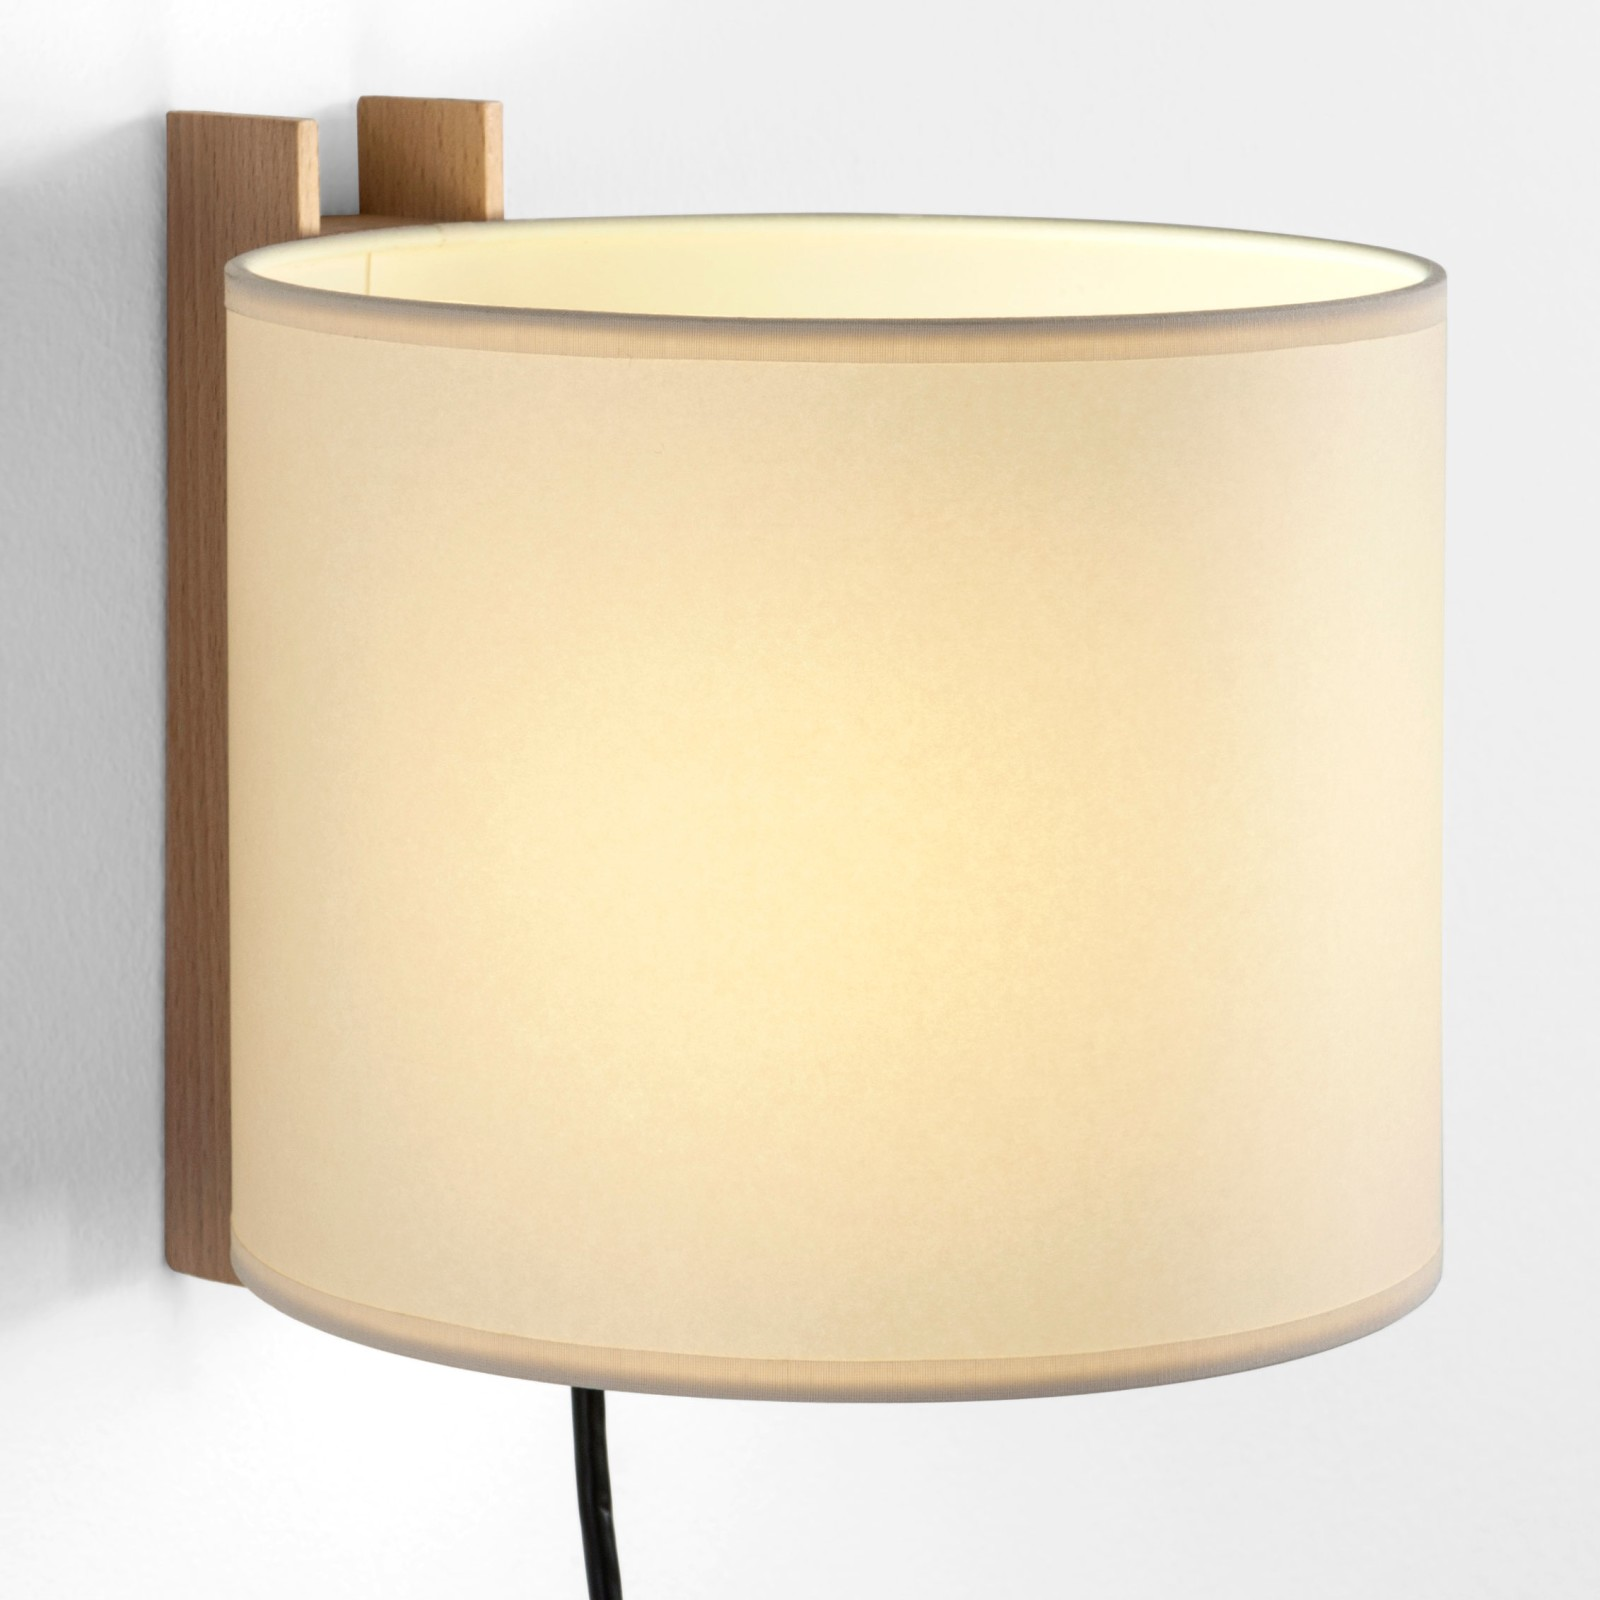 TMM Corto Wall Light Beige, With plug